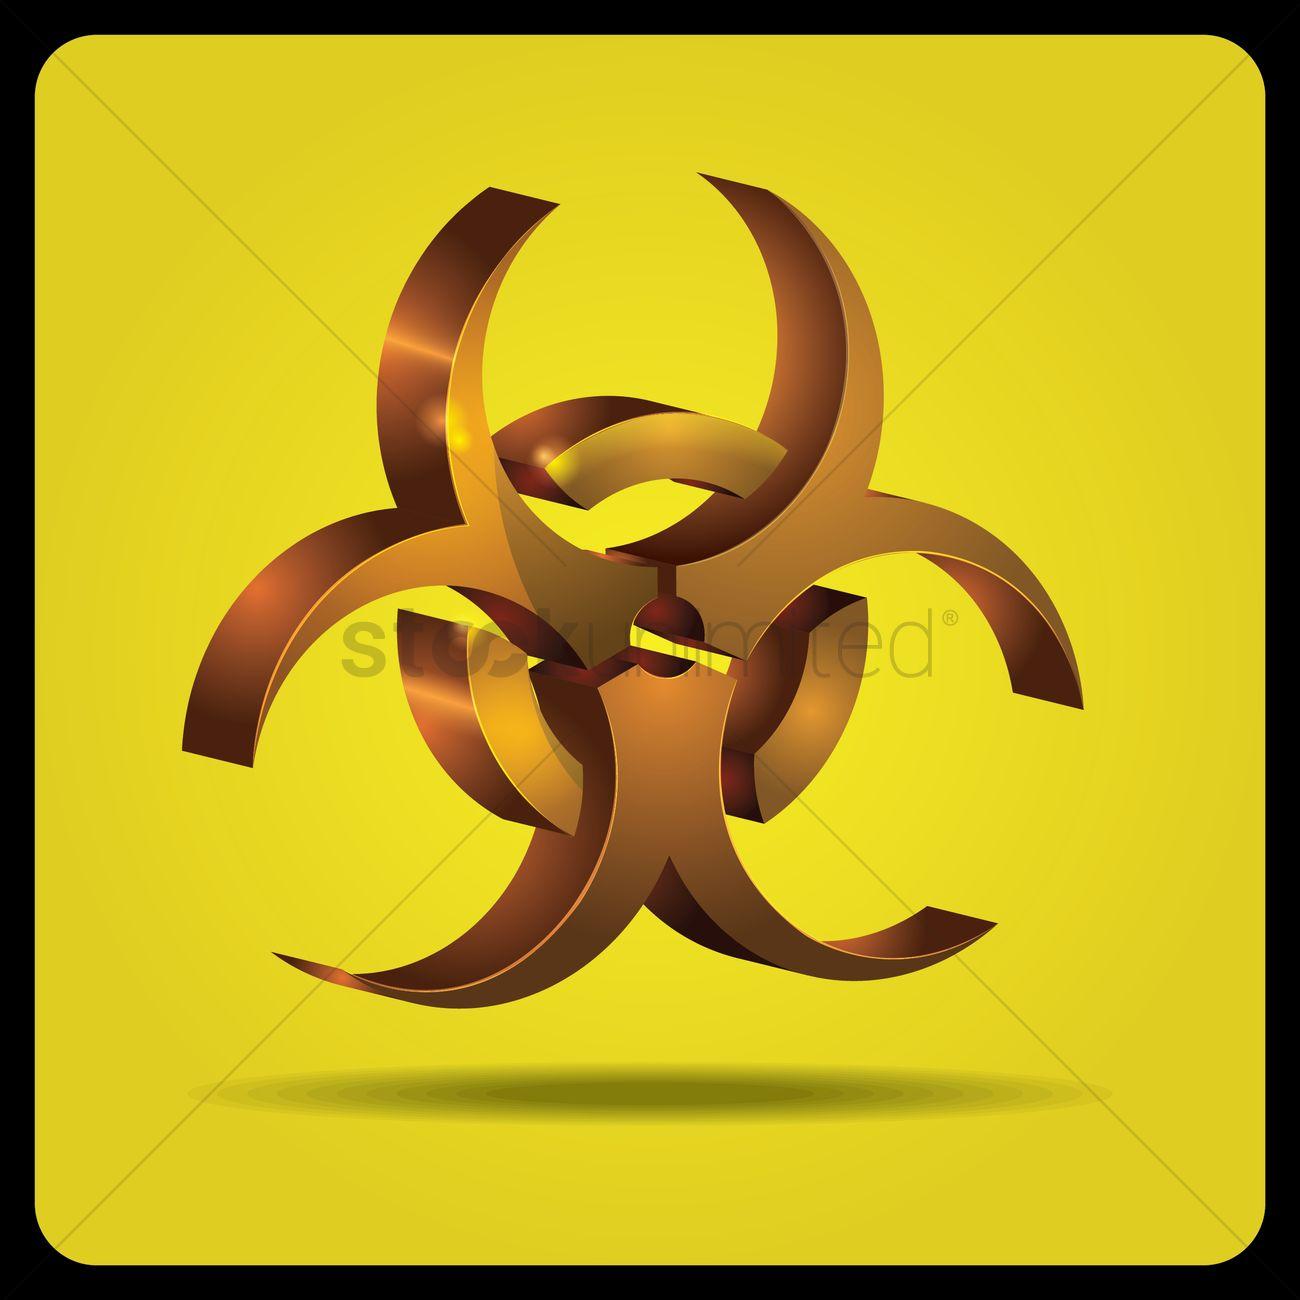 Biohazard Symbol Vector Image 1608153 Stockunlimited